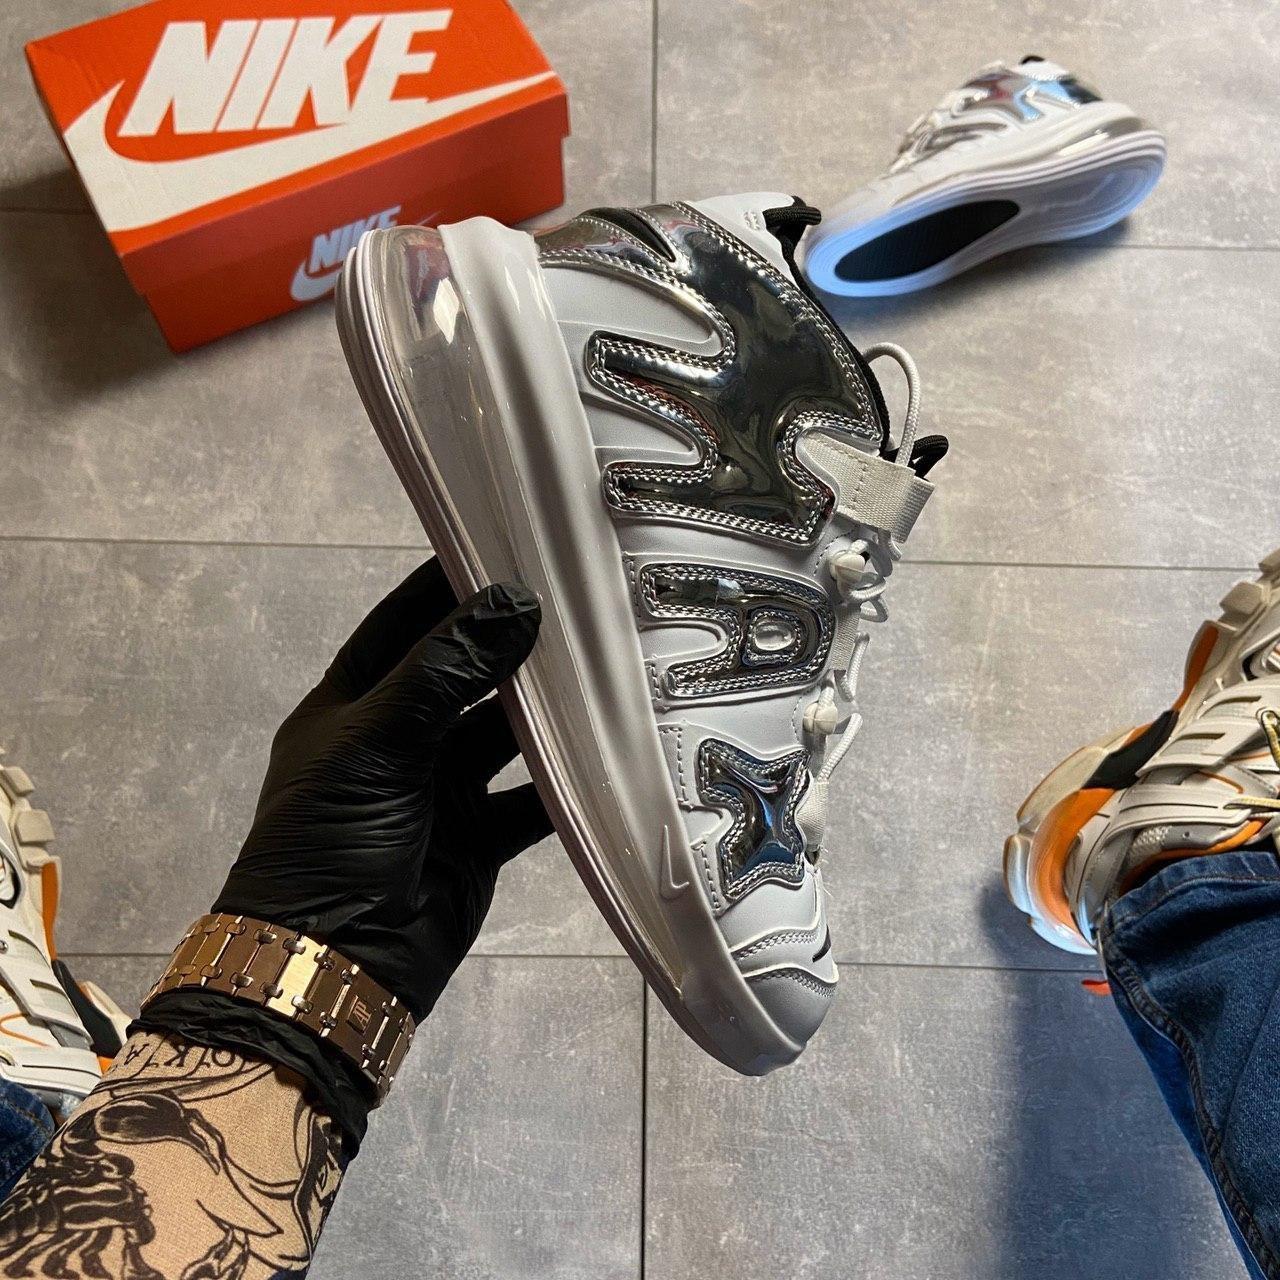 🔥 ВИДЕО ОБЗОР 🔥 Nike Air More Uptempo 720 White Silver Найк Аир 🔥 Найк мужские кроссовки 🔥